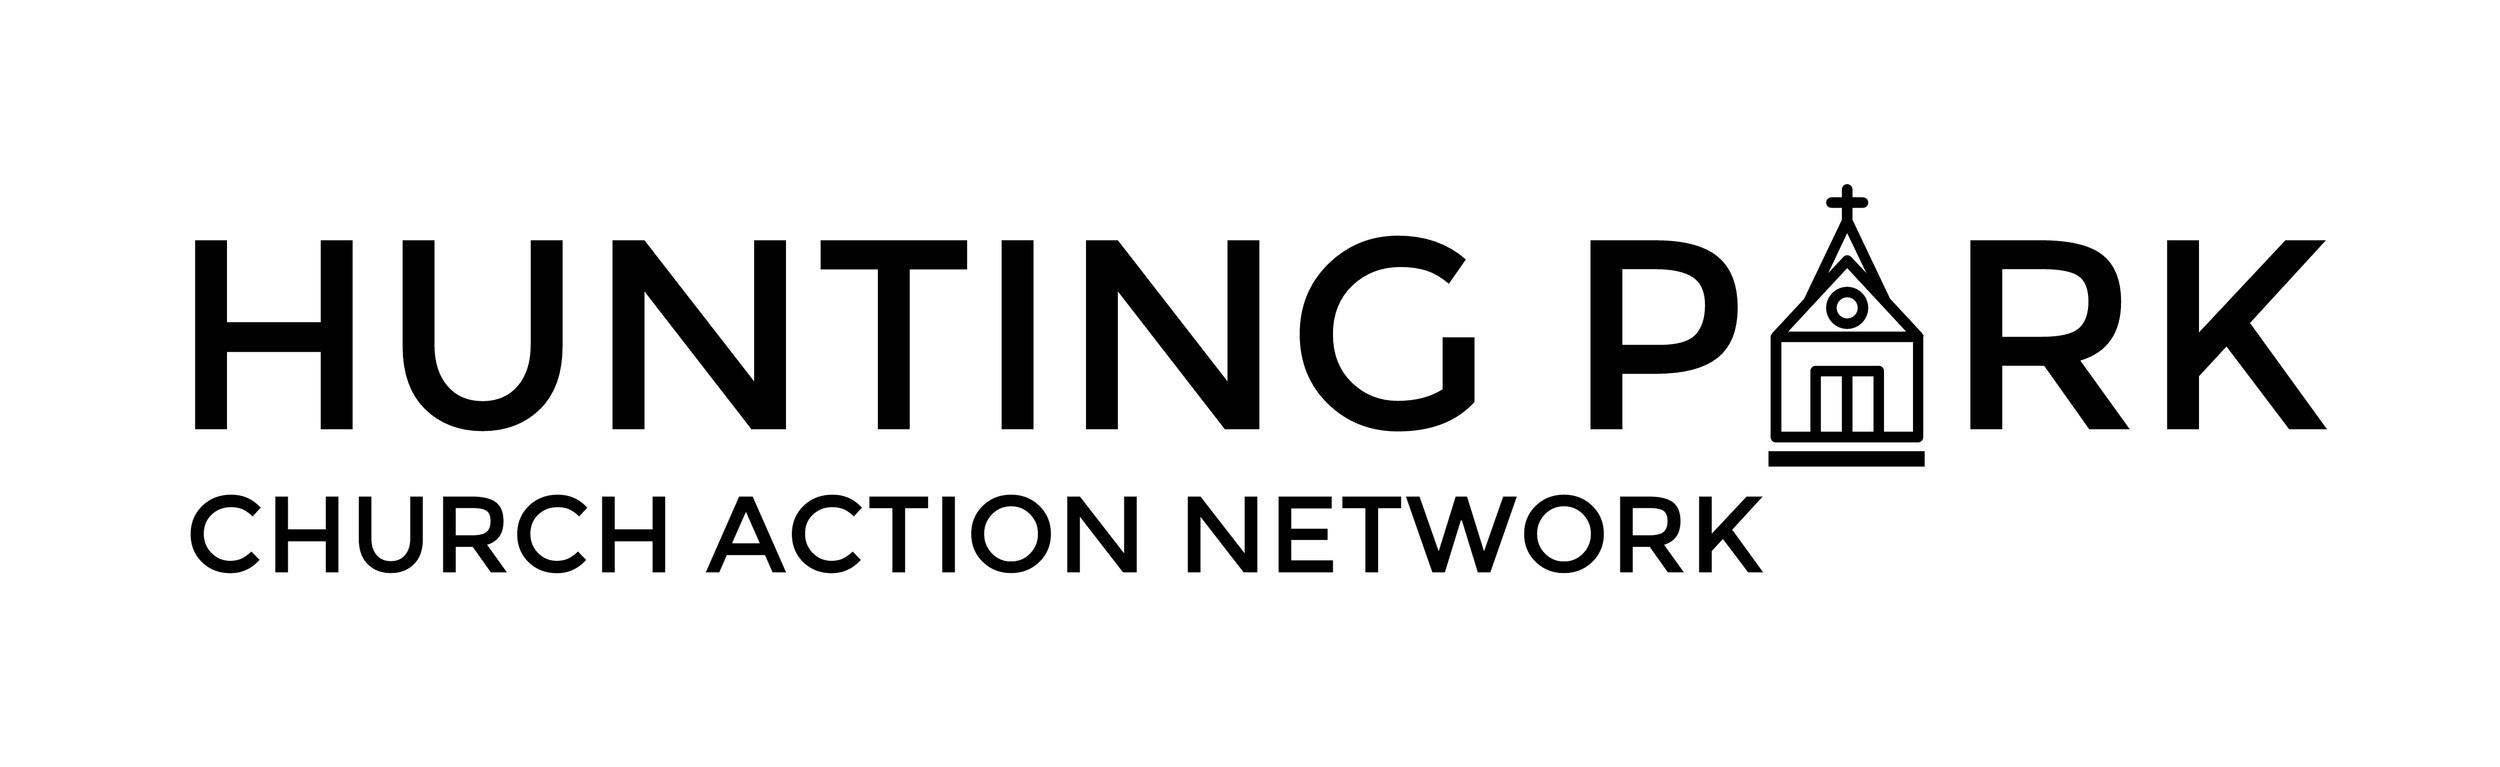 HUNTING P_RK-logo-black.jpg